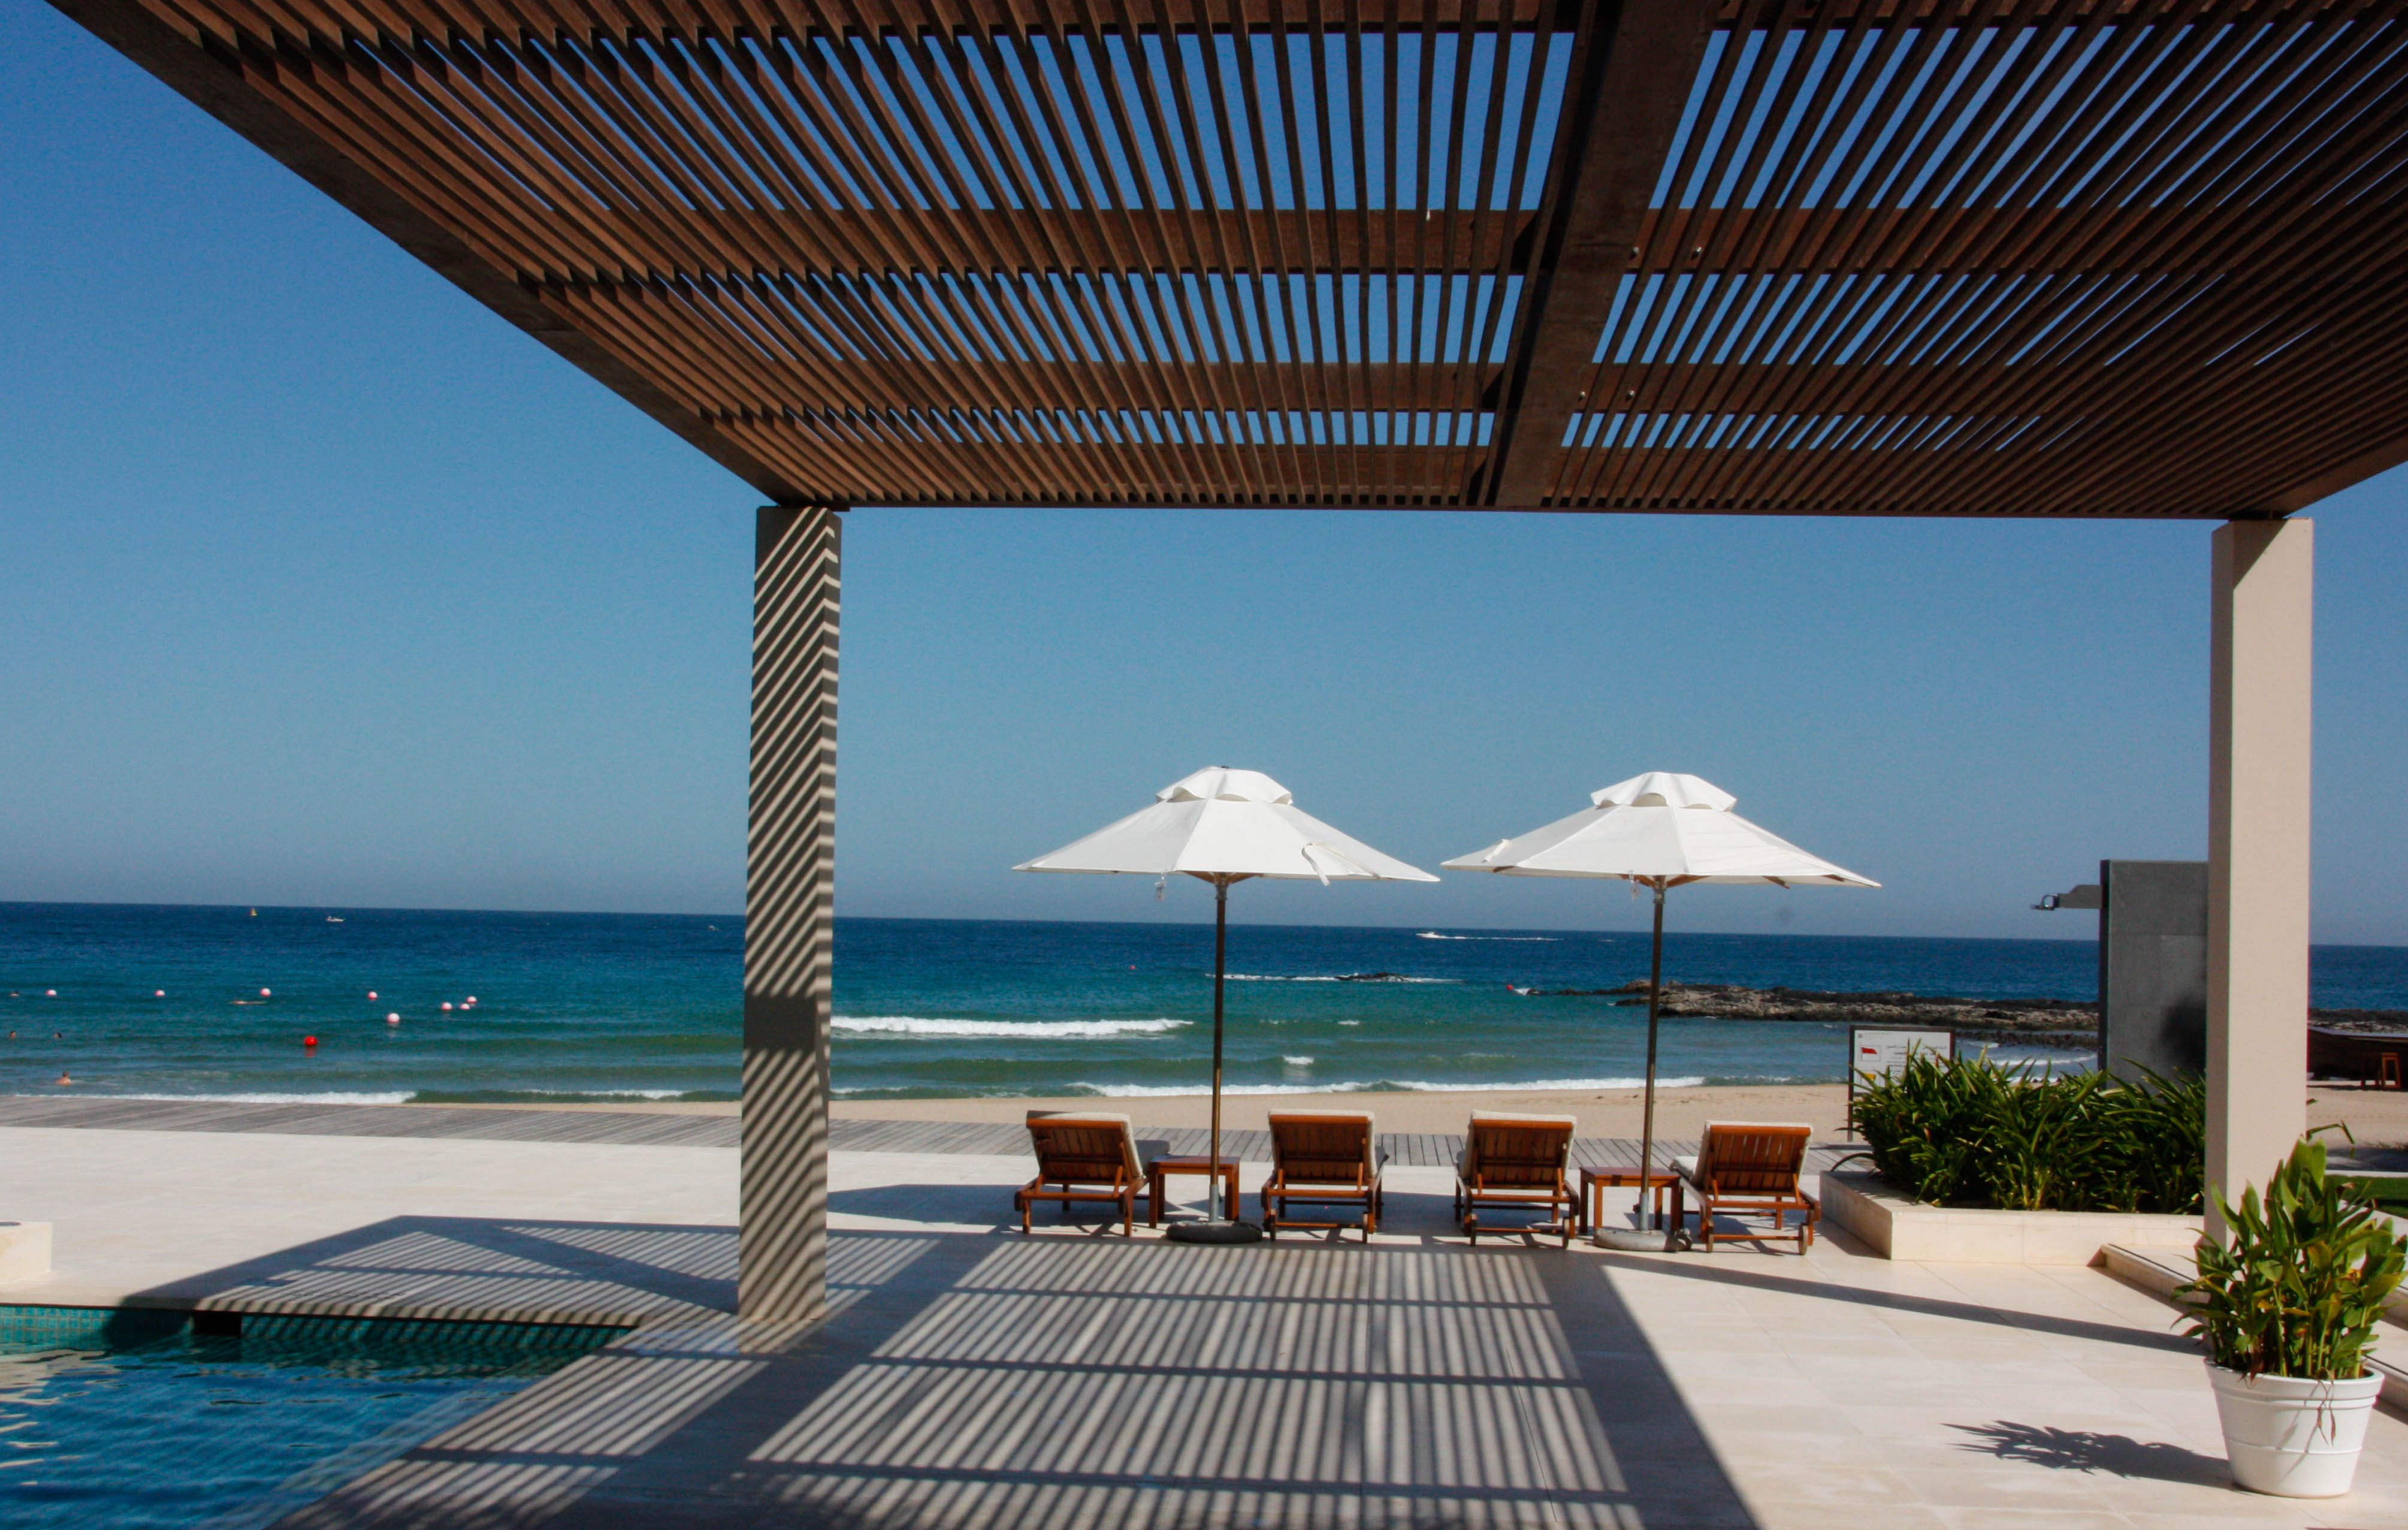 Sensational Wooden Pergola Cover With Pool Shade And White Patio Umbrellas  Featu2026